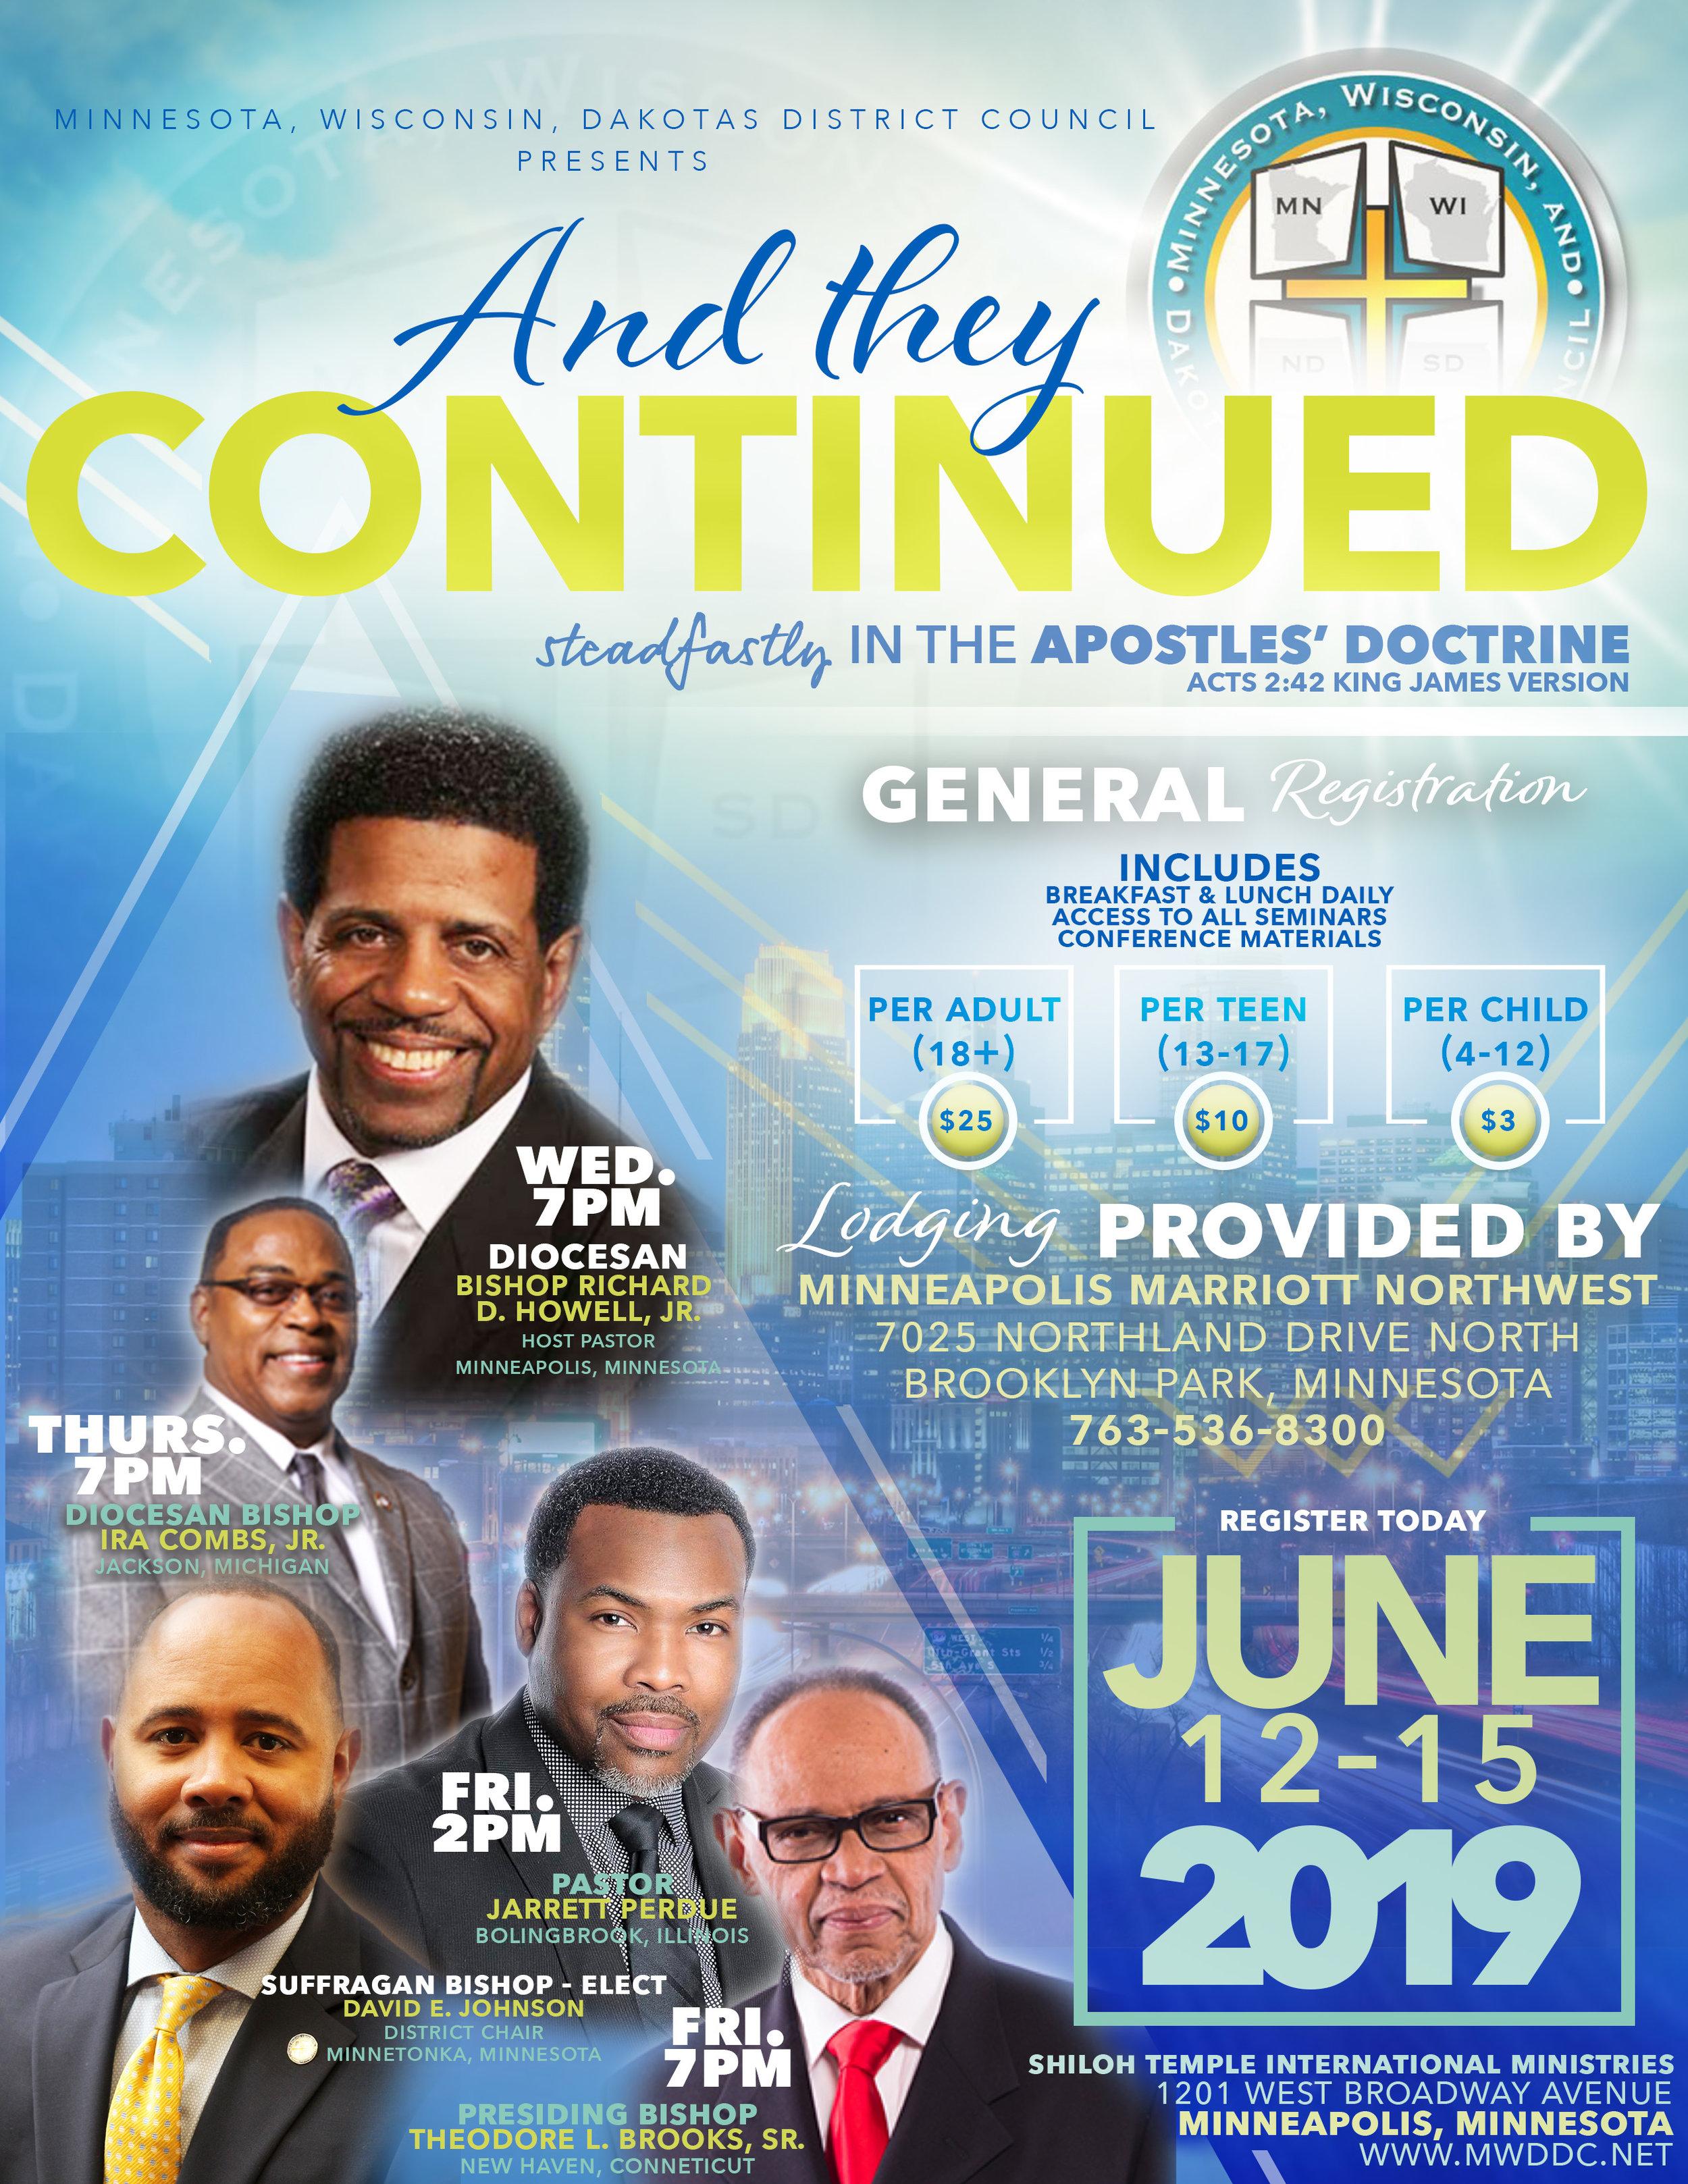 MWDDC June Council 2019.jpg